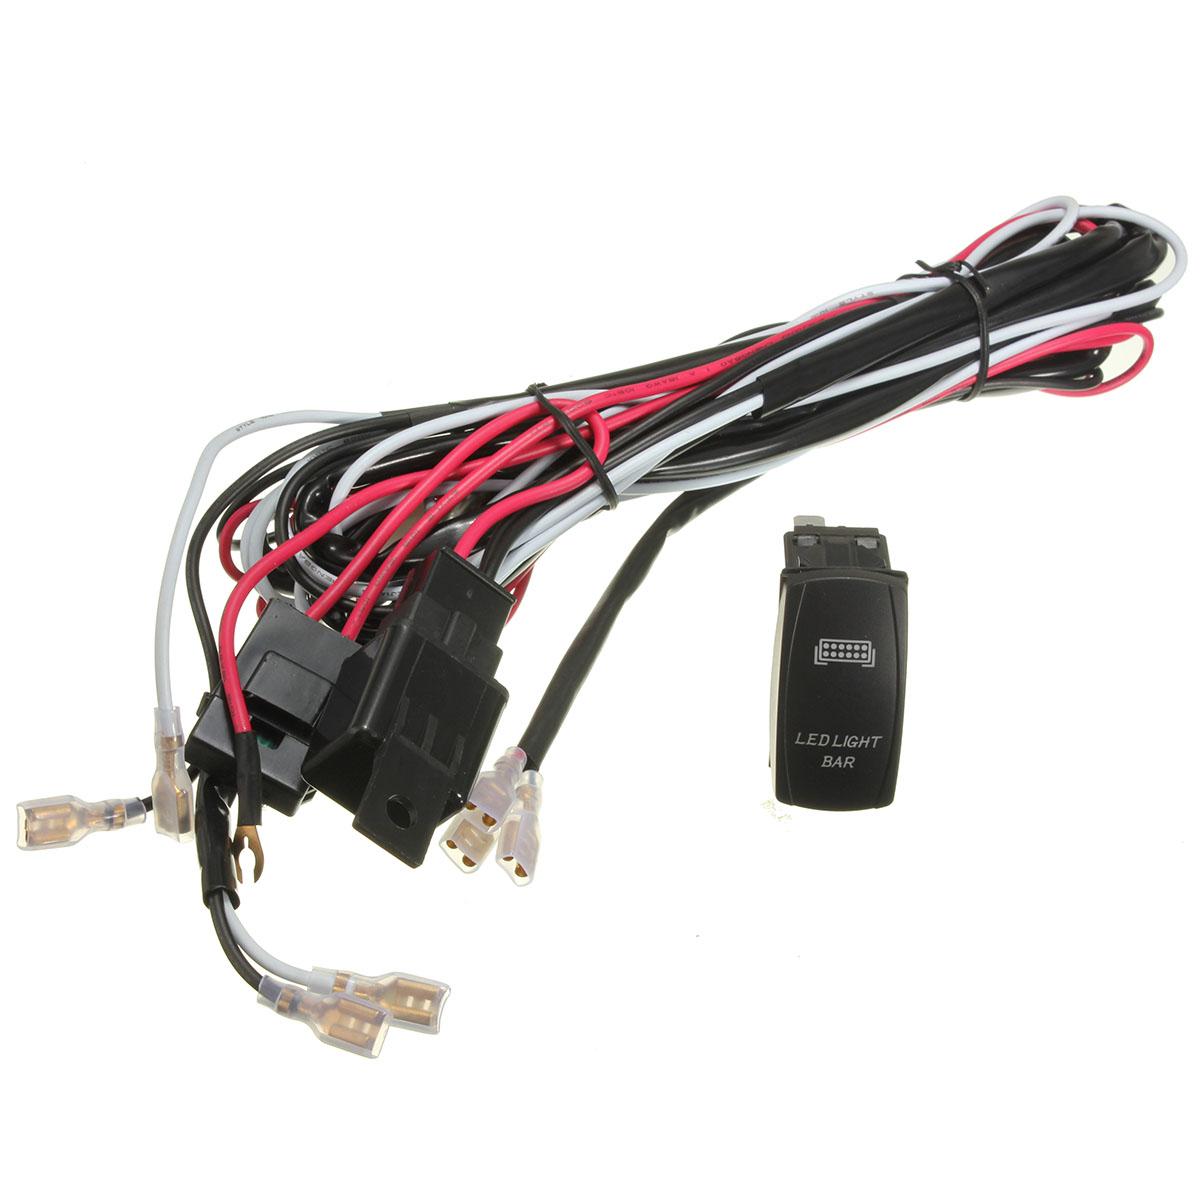 atv jeep led light bar wiring harness 12v 40a relay on off. Black Bedroom Furniture Sets. Home Design Ideas